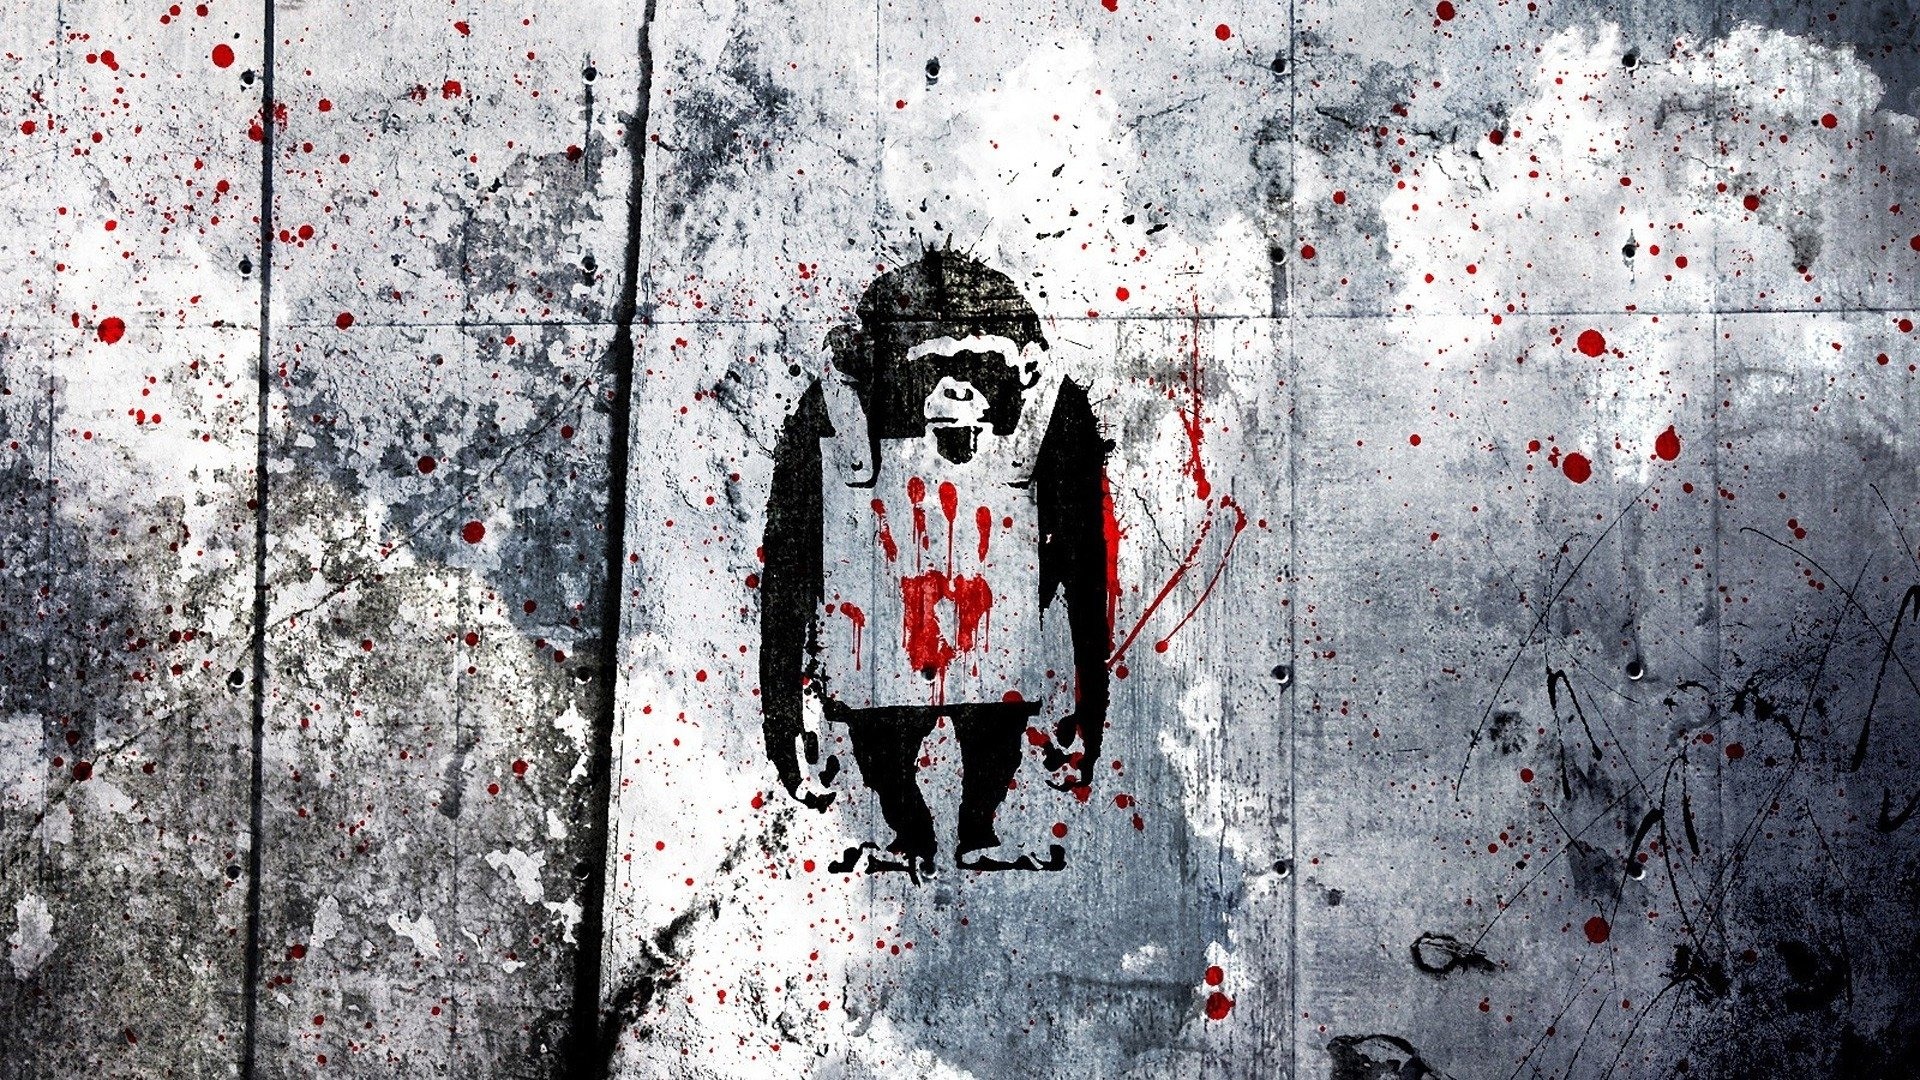 Banksy Graffiti Wallpaper 1920x1080